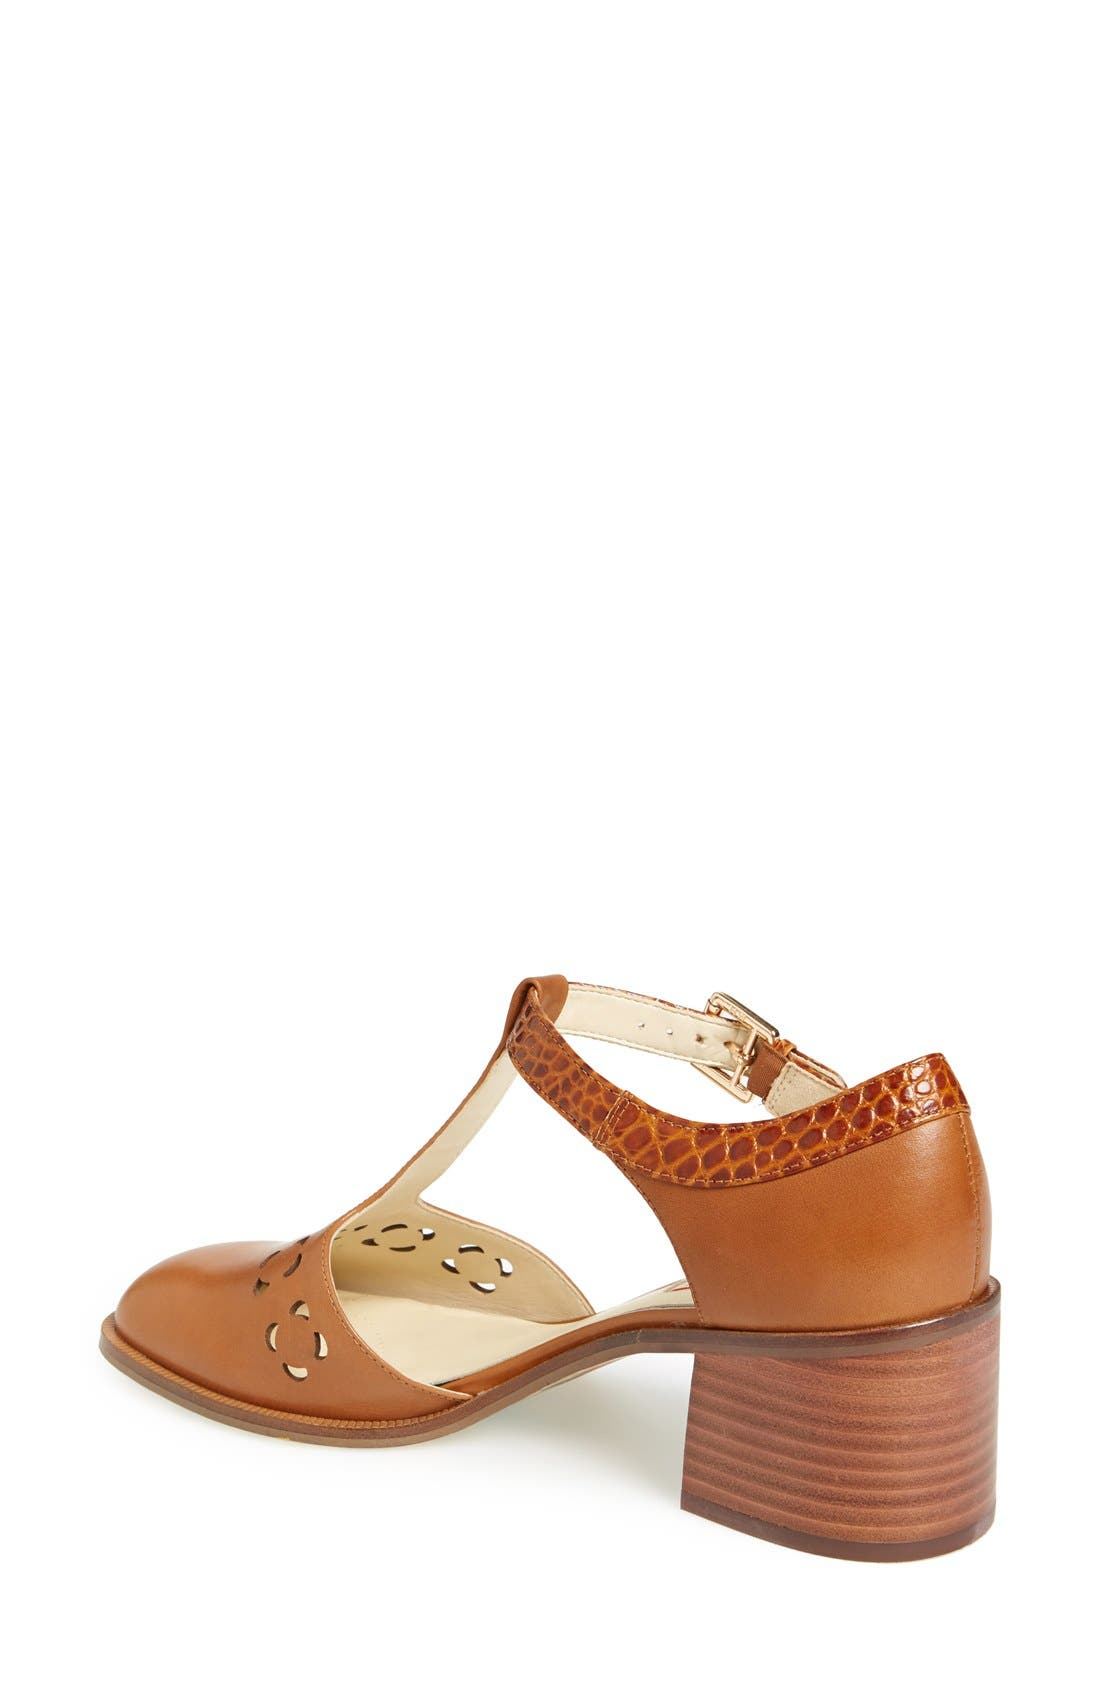 Clarks<sup>®</sup> x Orla Kiely 'Bibi' Leather T-Strap Sandal,                             Alternate thumbnail 4, color,                             200